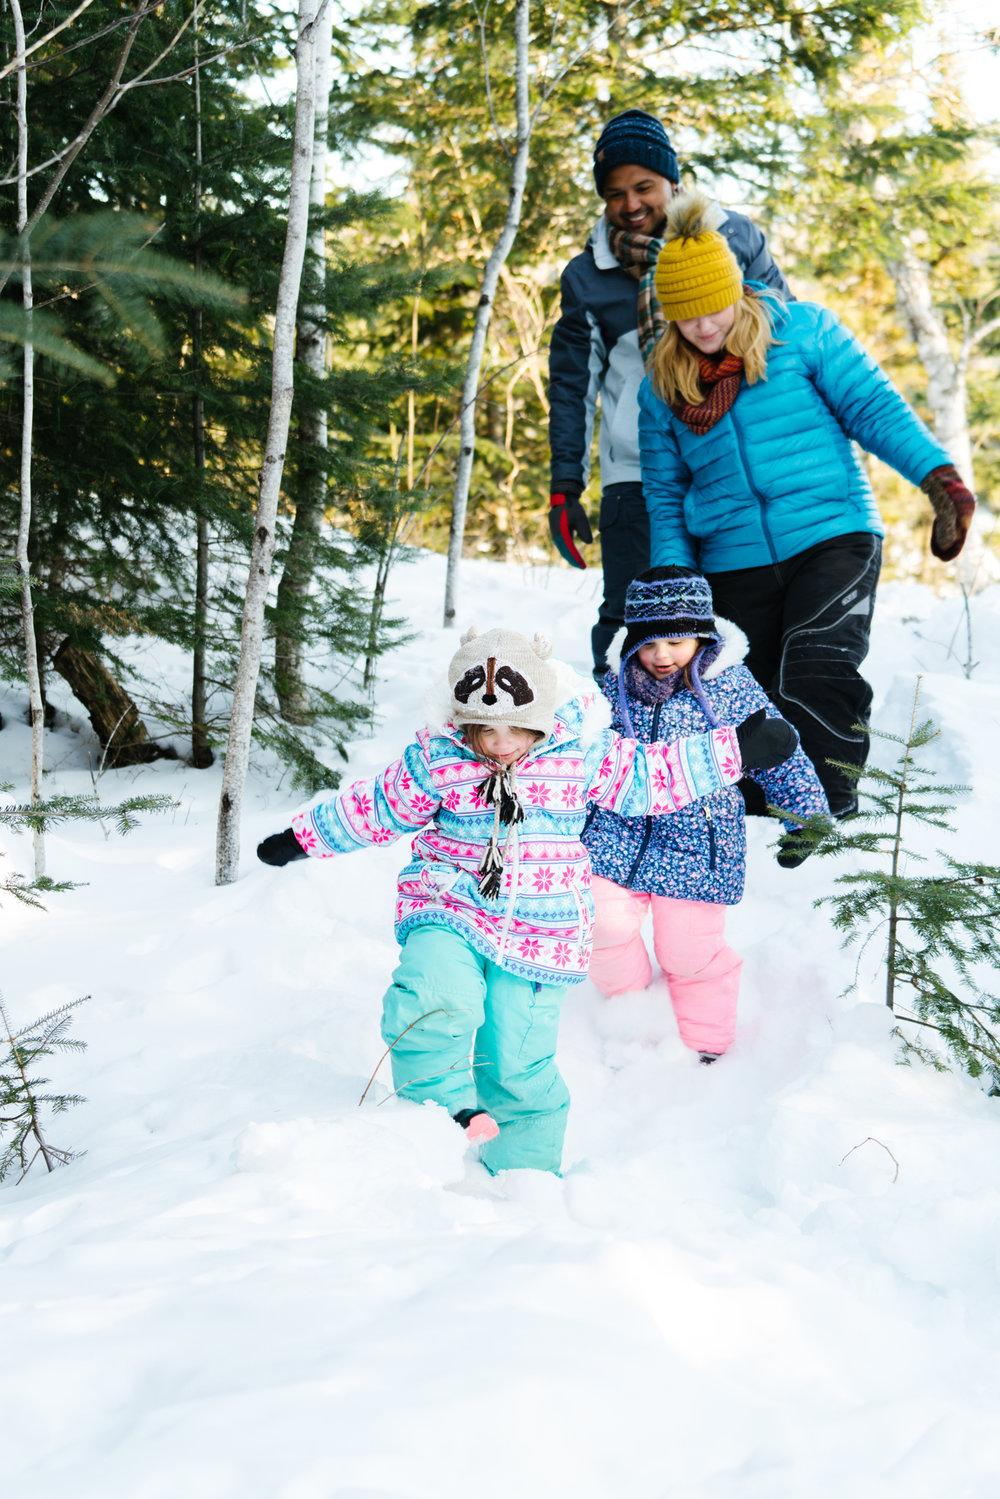 Commercial Family Winter Stock Photos